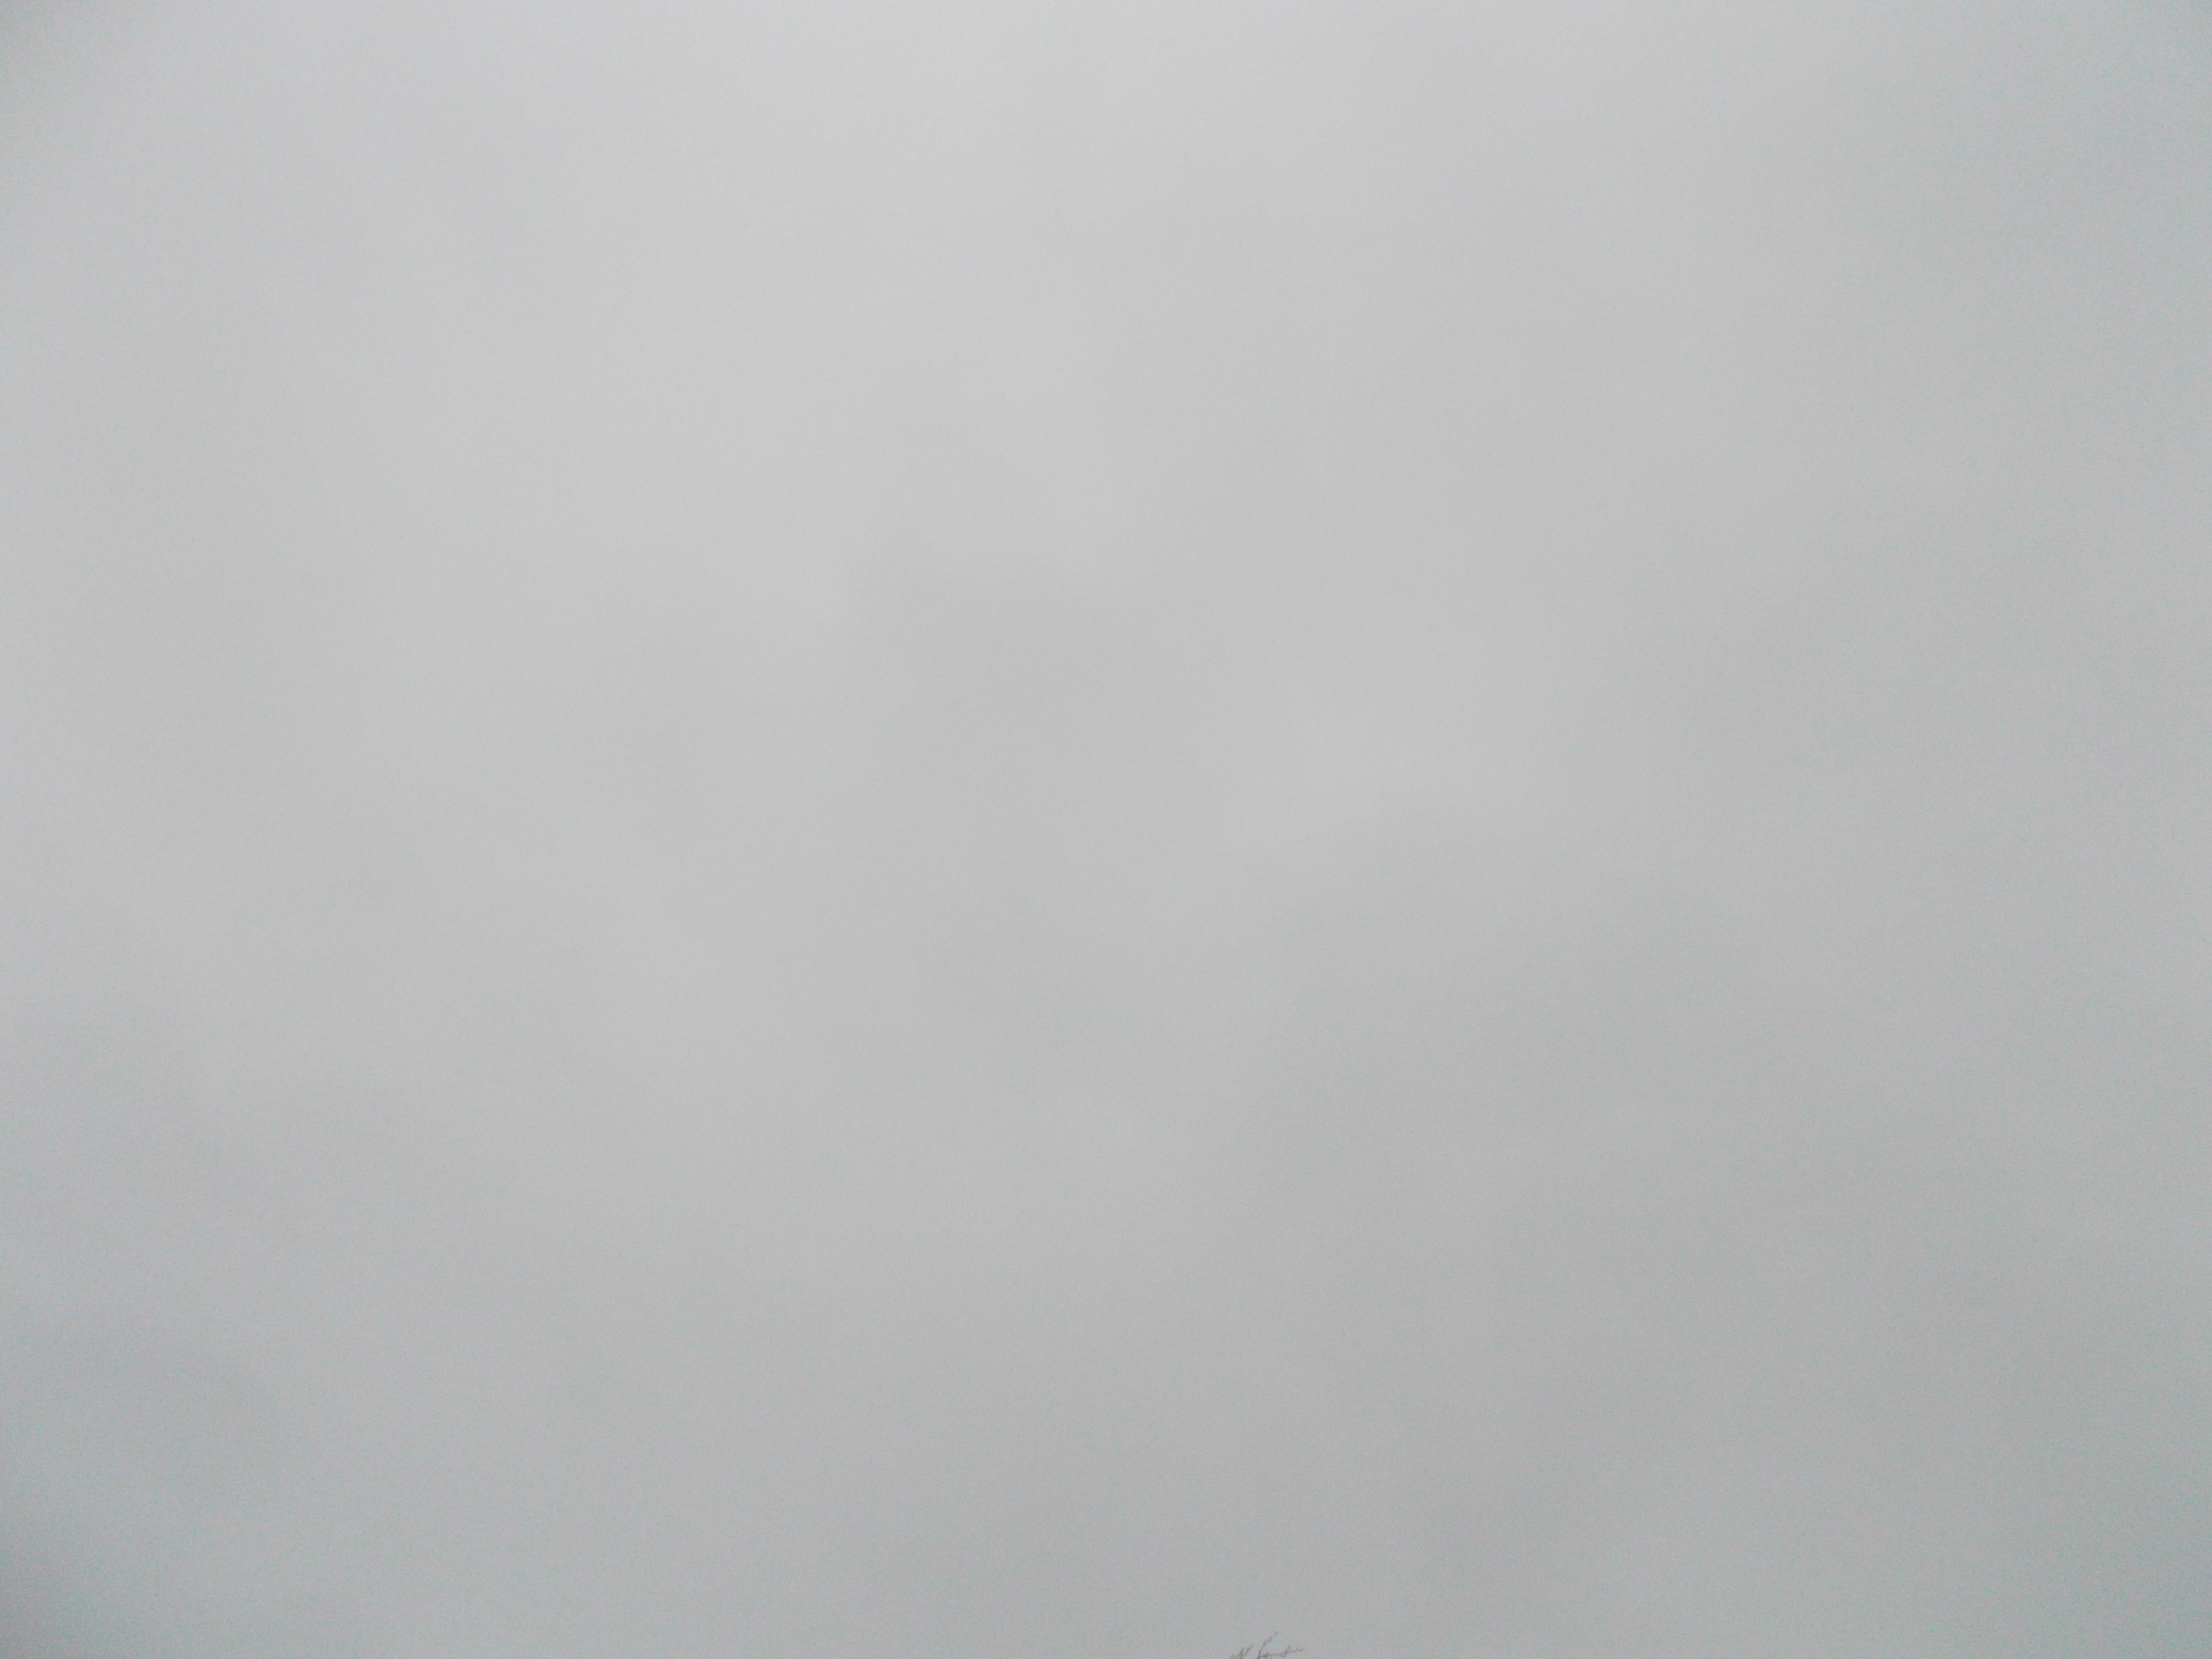 2013-02-27 Longitude -0.371 Latitude 49.182 Altitude 13 Heure 15h05